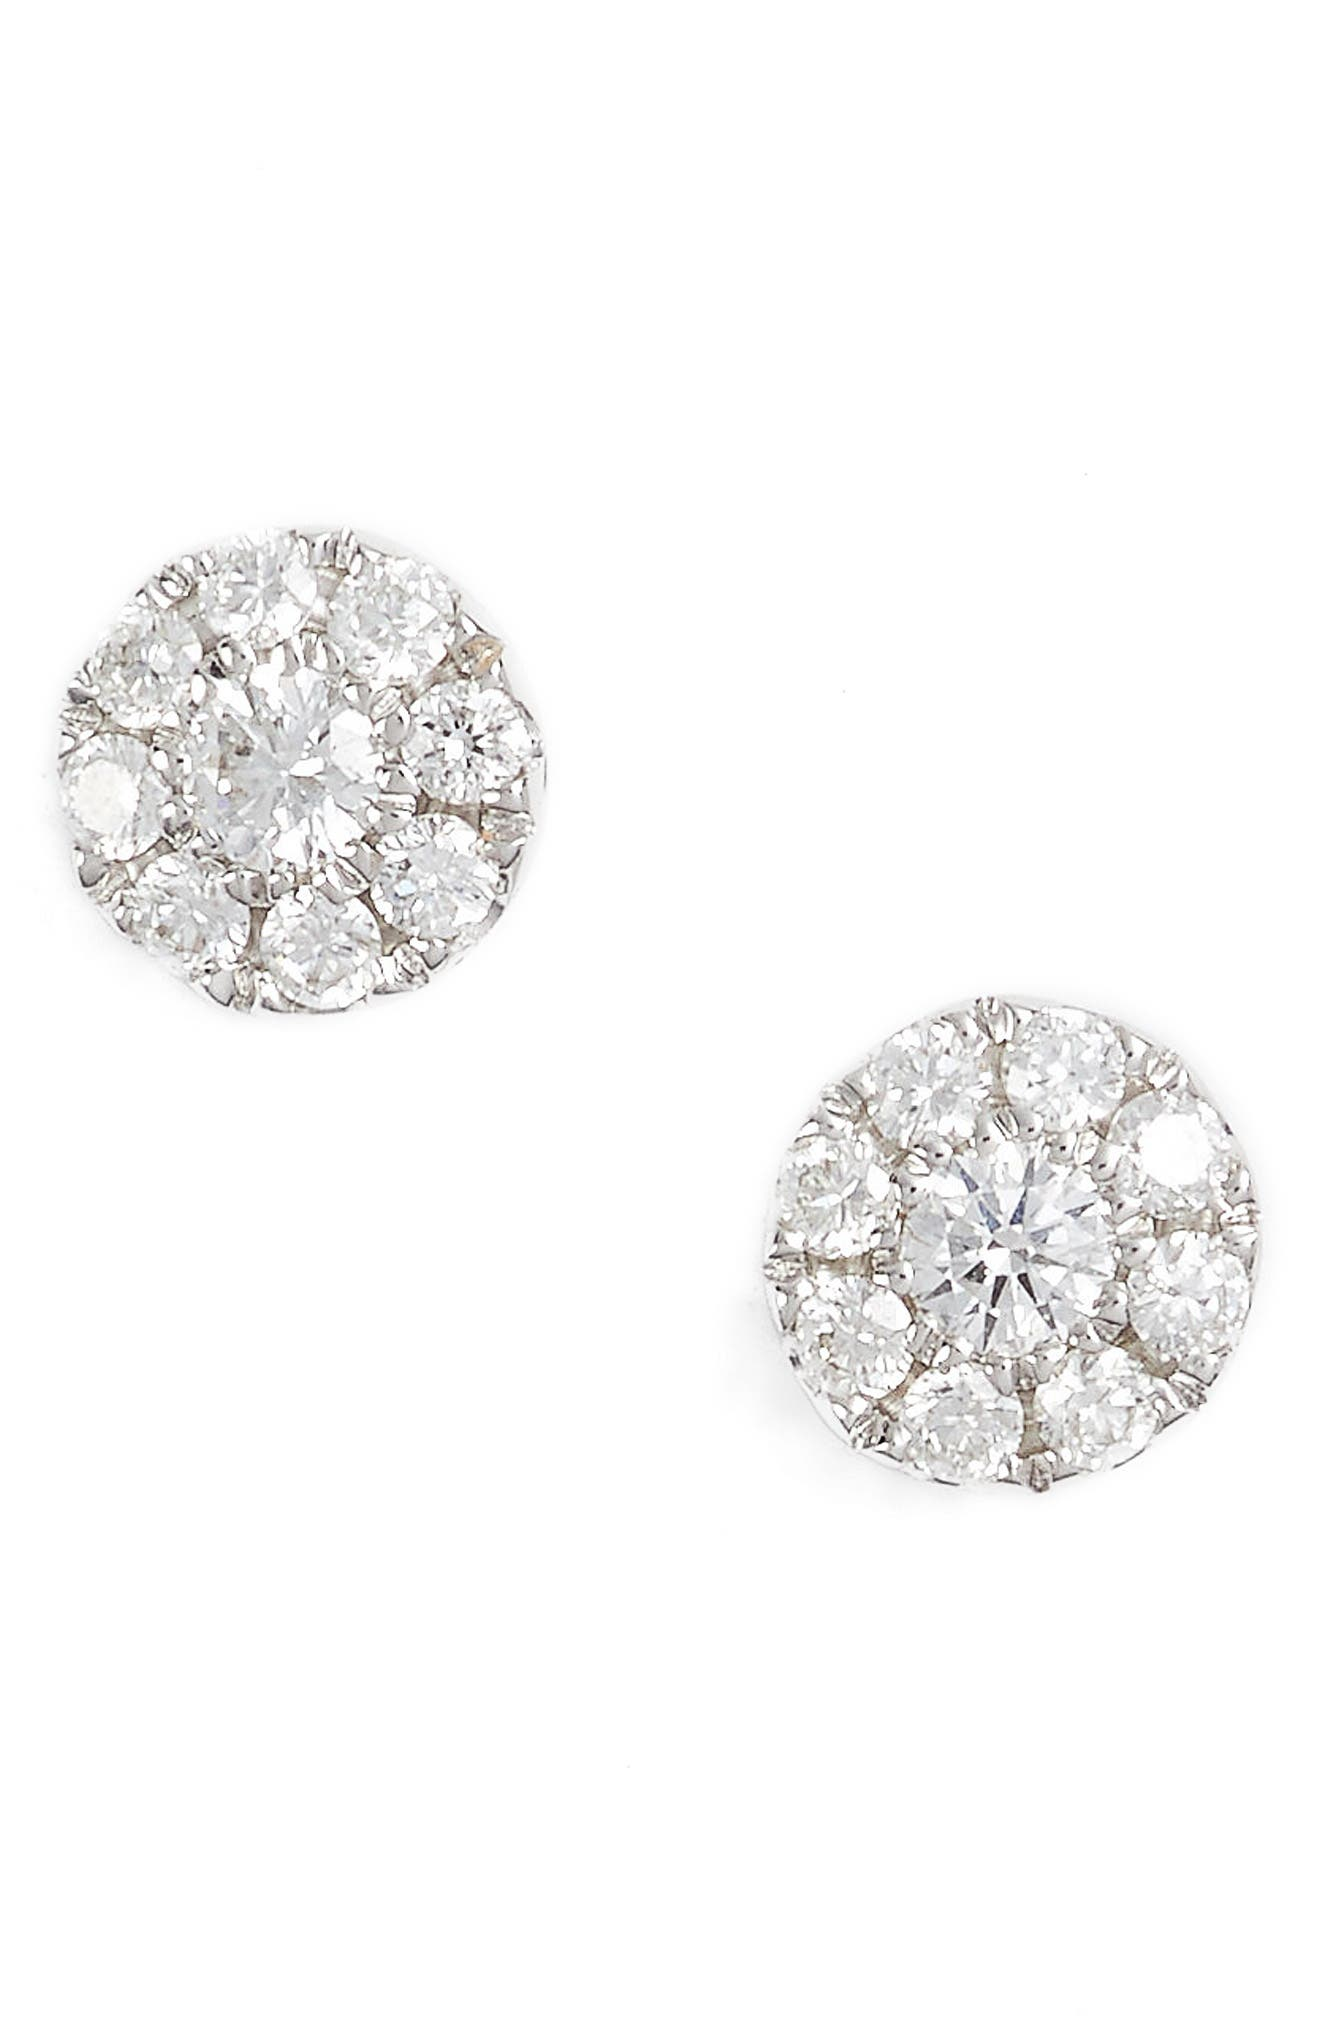 Simple Obsessions Pavé Diamond Stud Earrings,                             Main thumbnail 1, color,                             WHITE GOLD